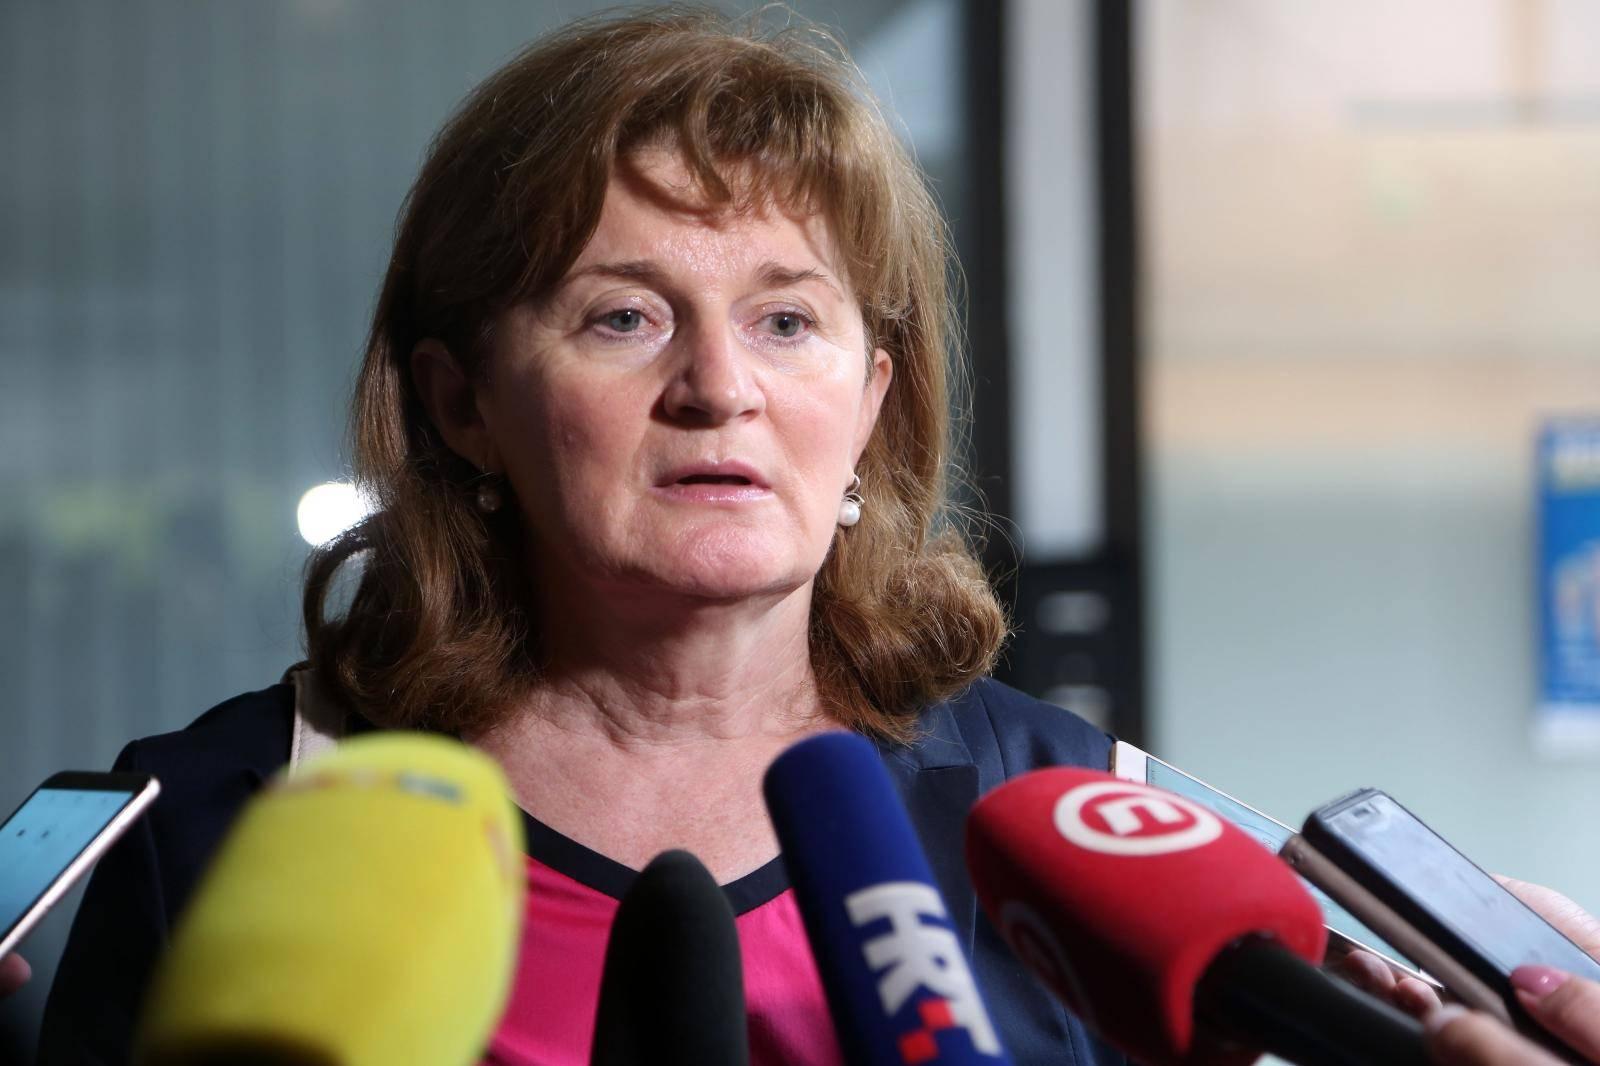 Zagreb: Izjave predstavnika sindikata nakon sastanka s ministrom Kujundžićem